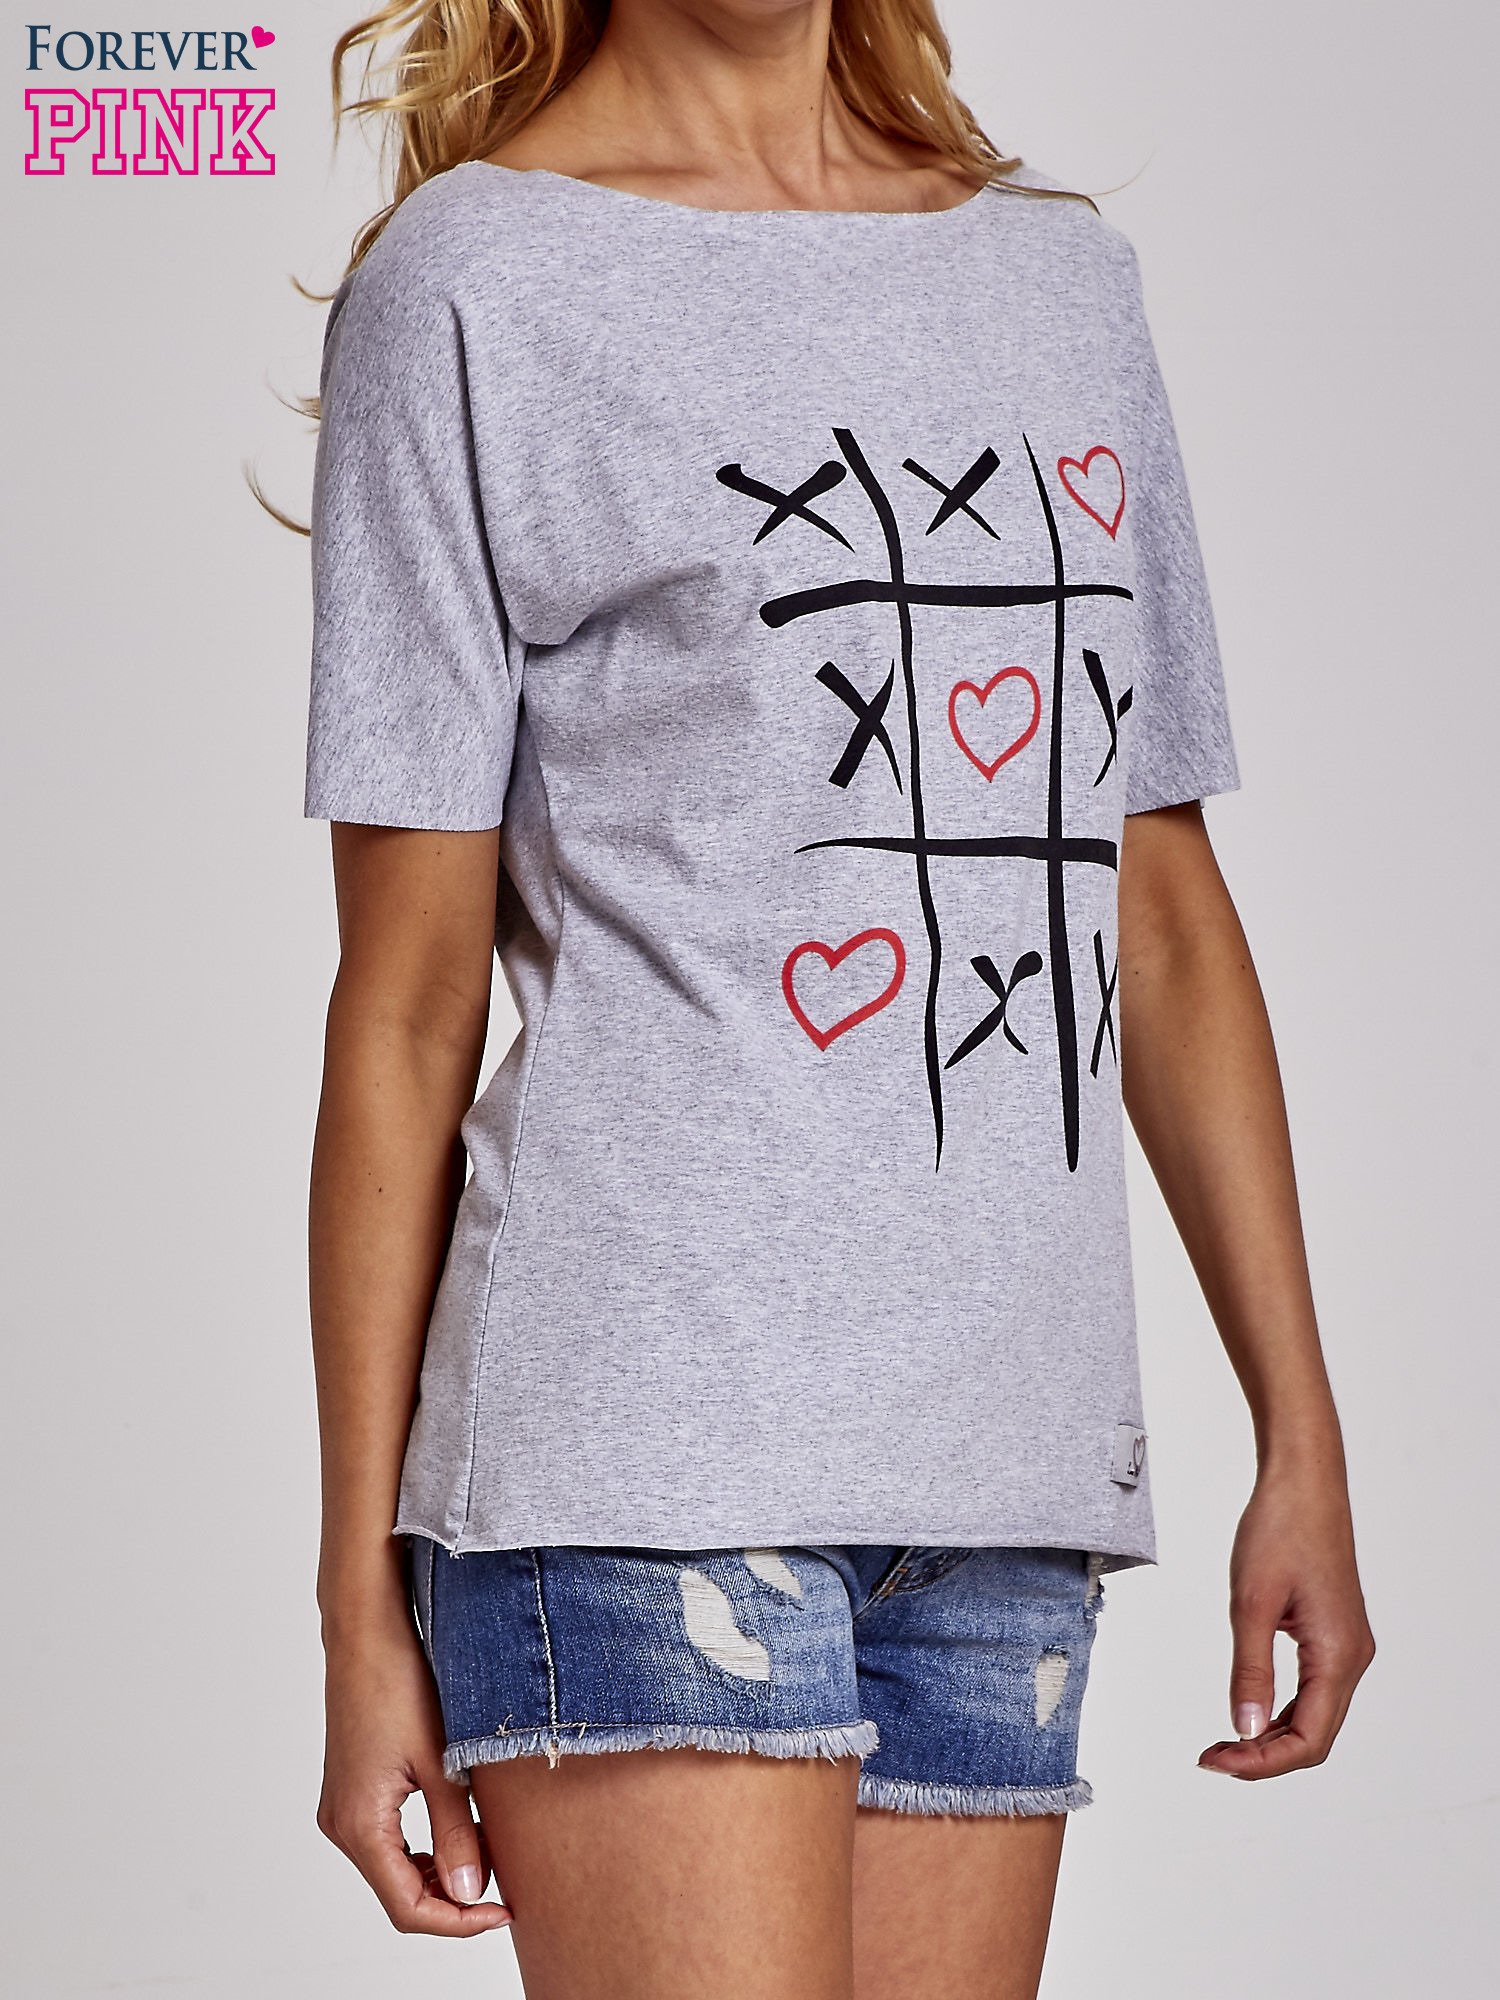 Szary t-shirt z motywem serce i krzyżyk                                  zdj.                                  3